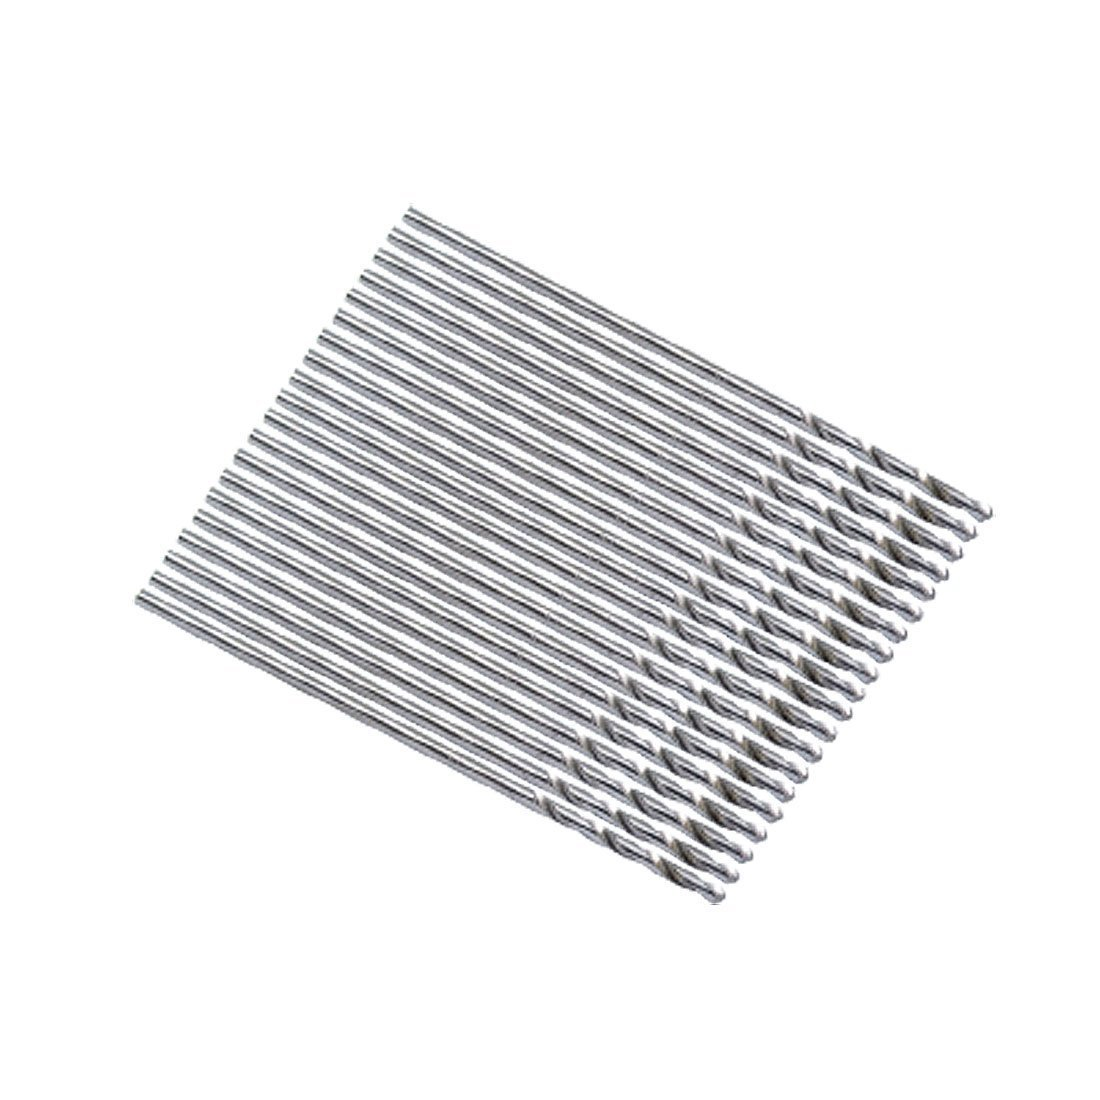 Straight Shank Twisted Drill Bit - SODIAL(R) 20 Pieces Metal Straight Shank 0.8mm Twisted Drill Bit